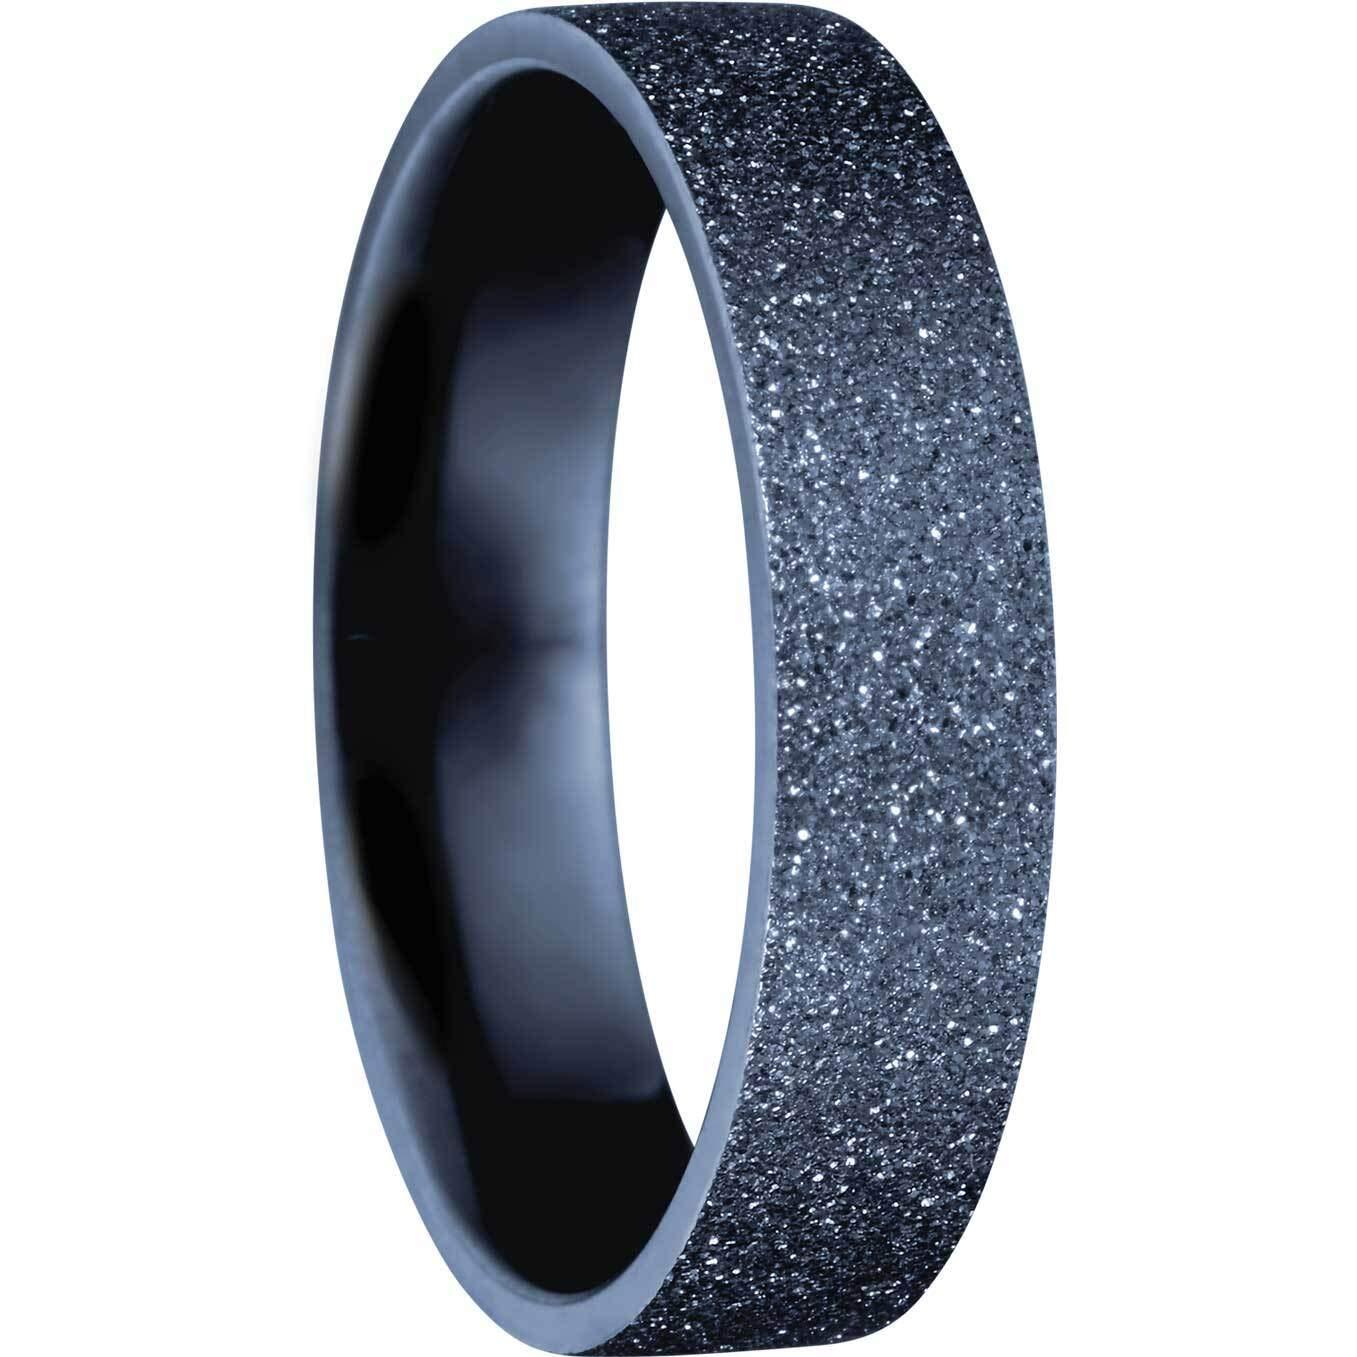 Bering Innenring 557-79-72 Stardust blau breit